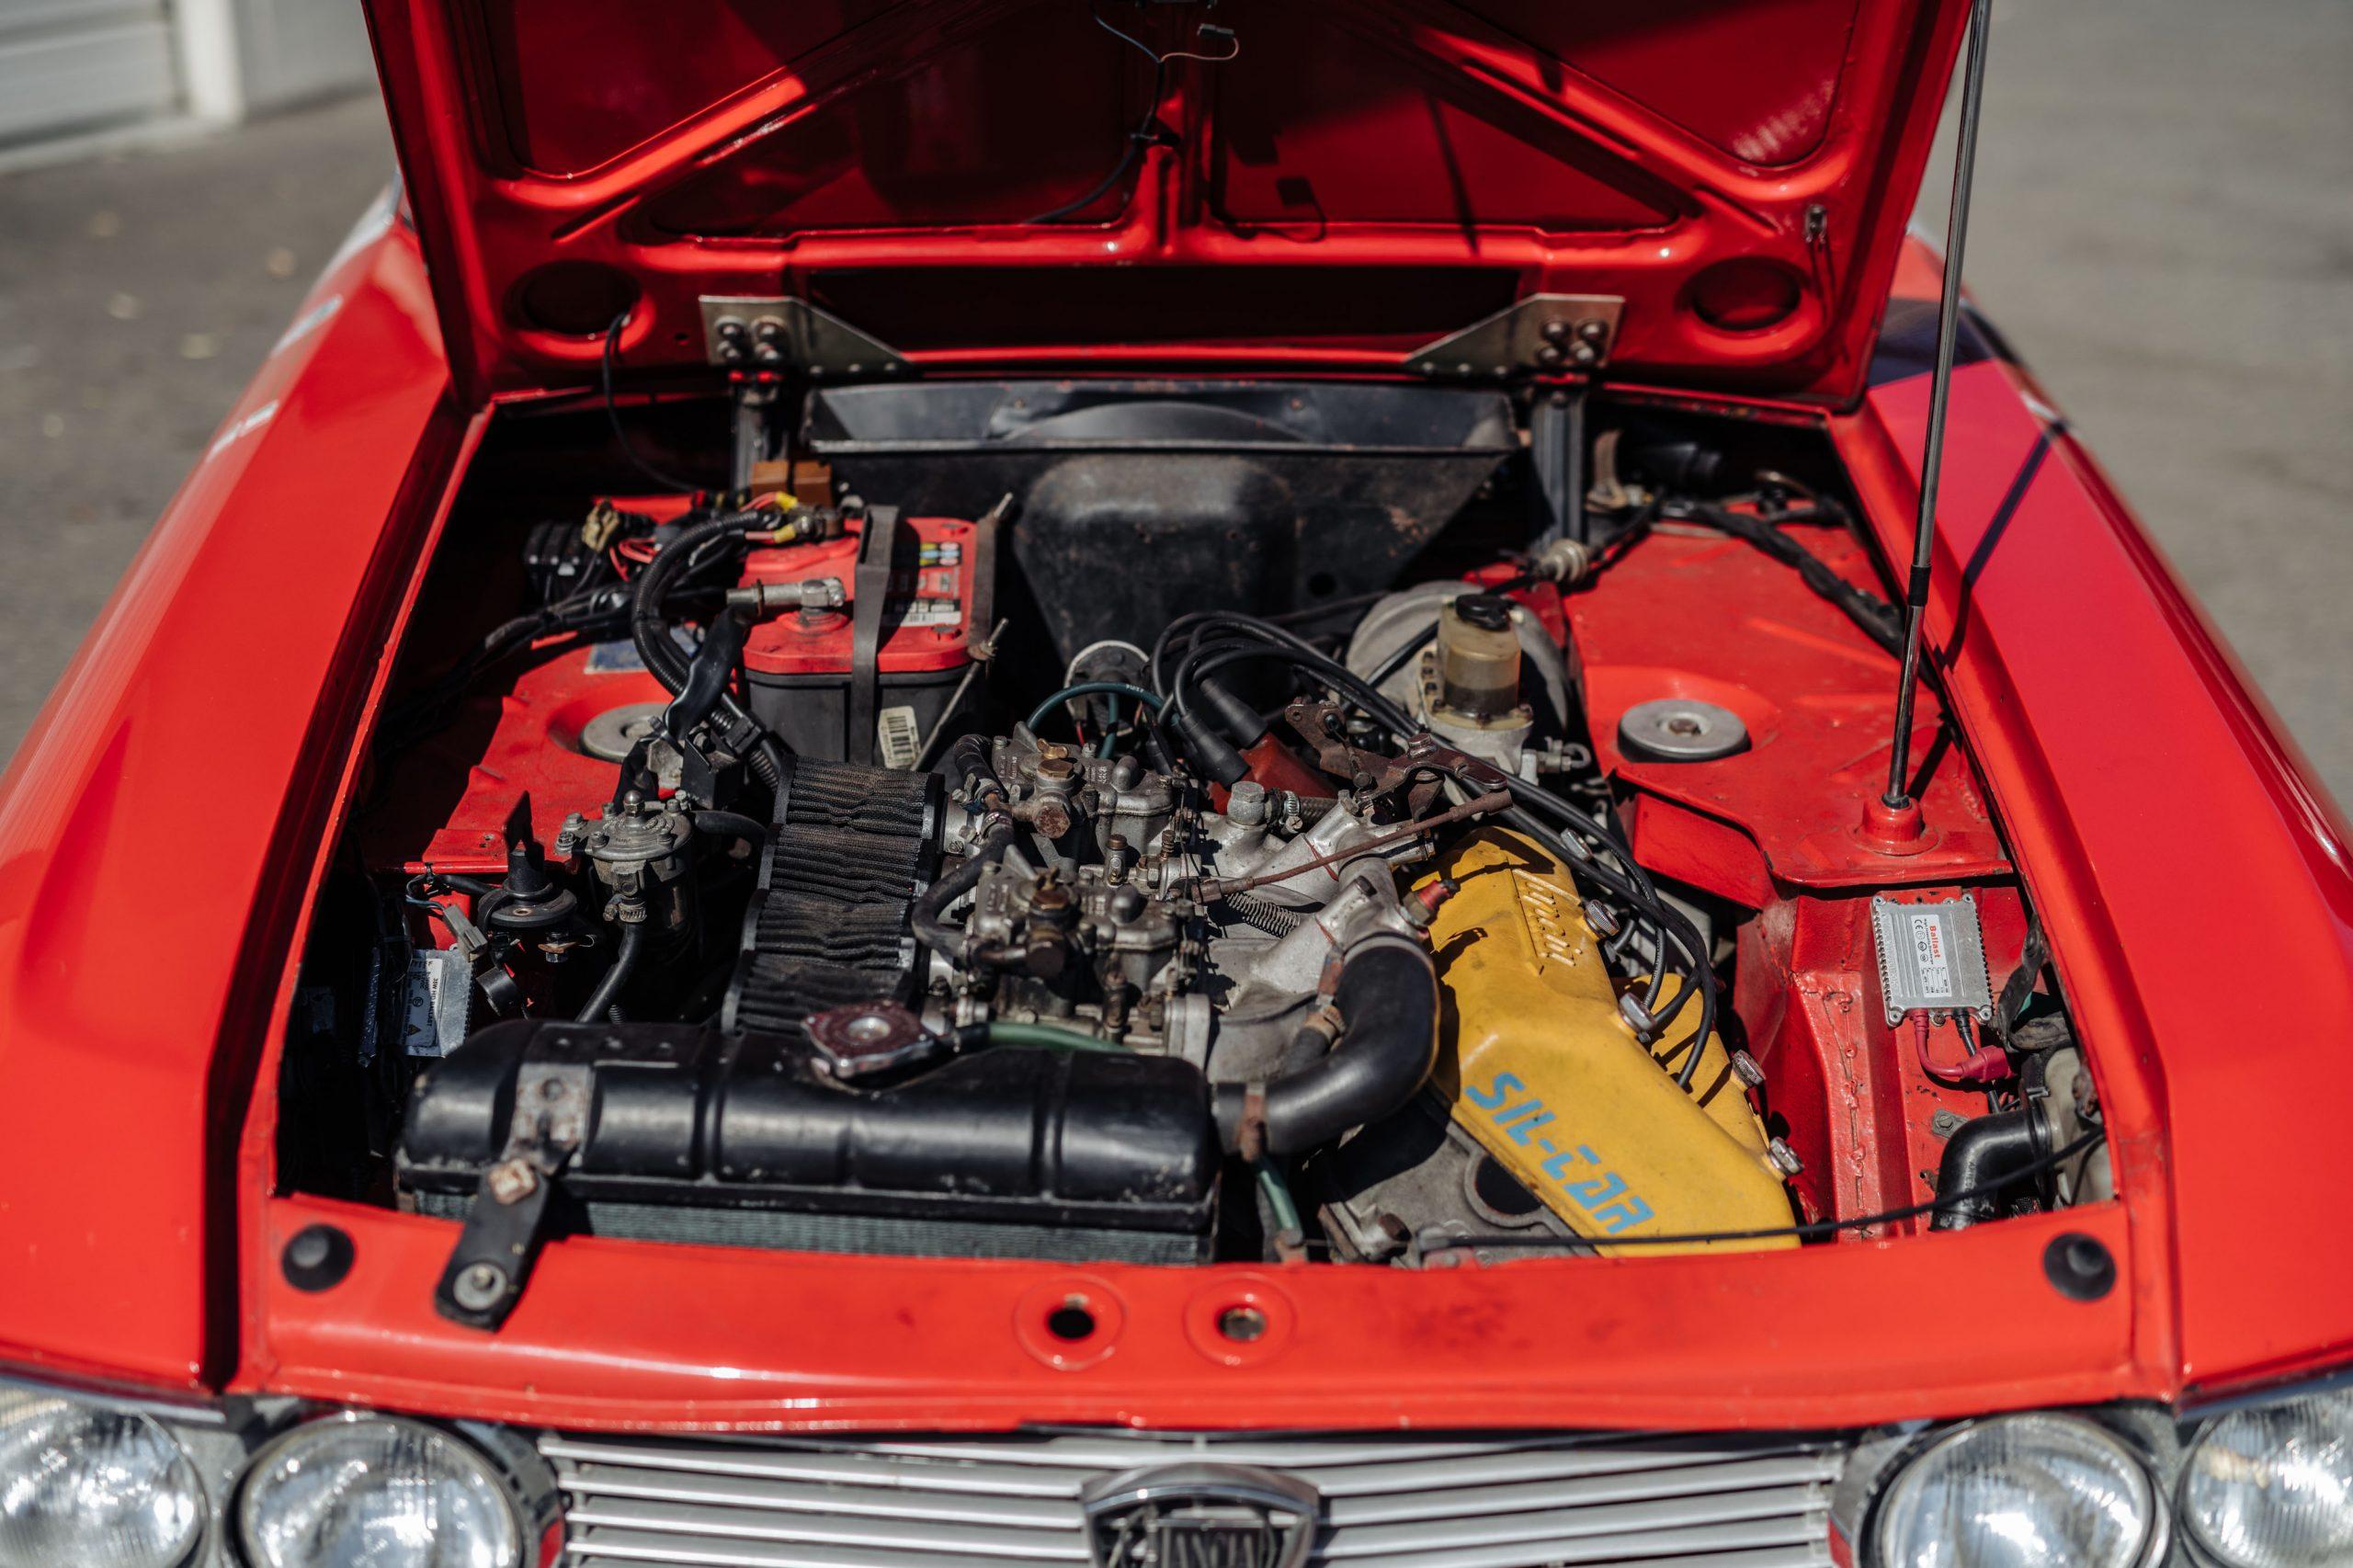 1972 Lancia Fulvia Coupe 1600 HF Series 2 Fanalino engine bay